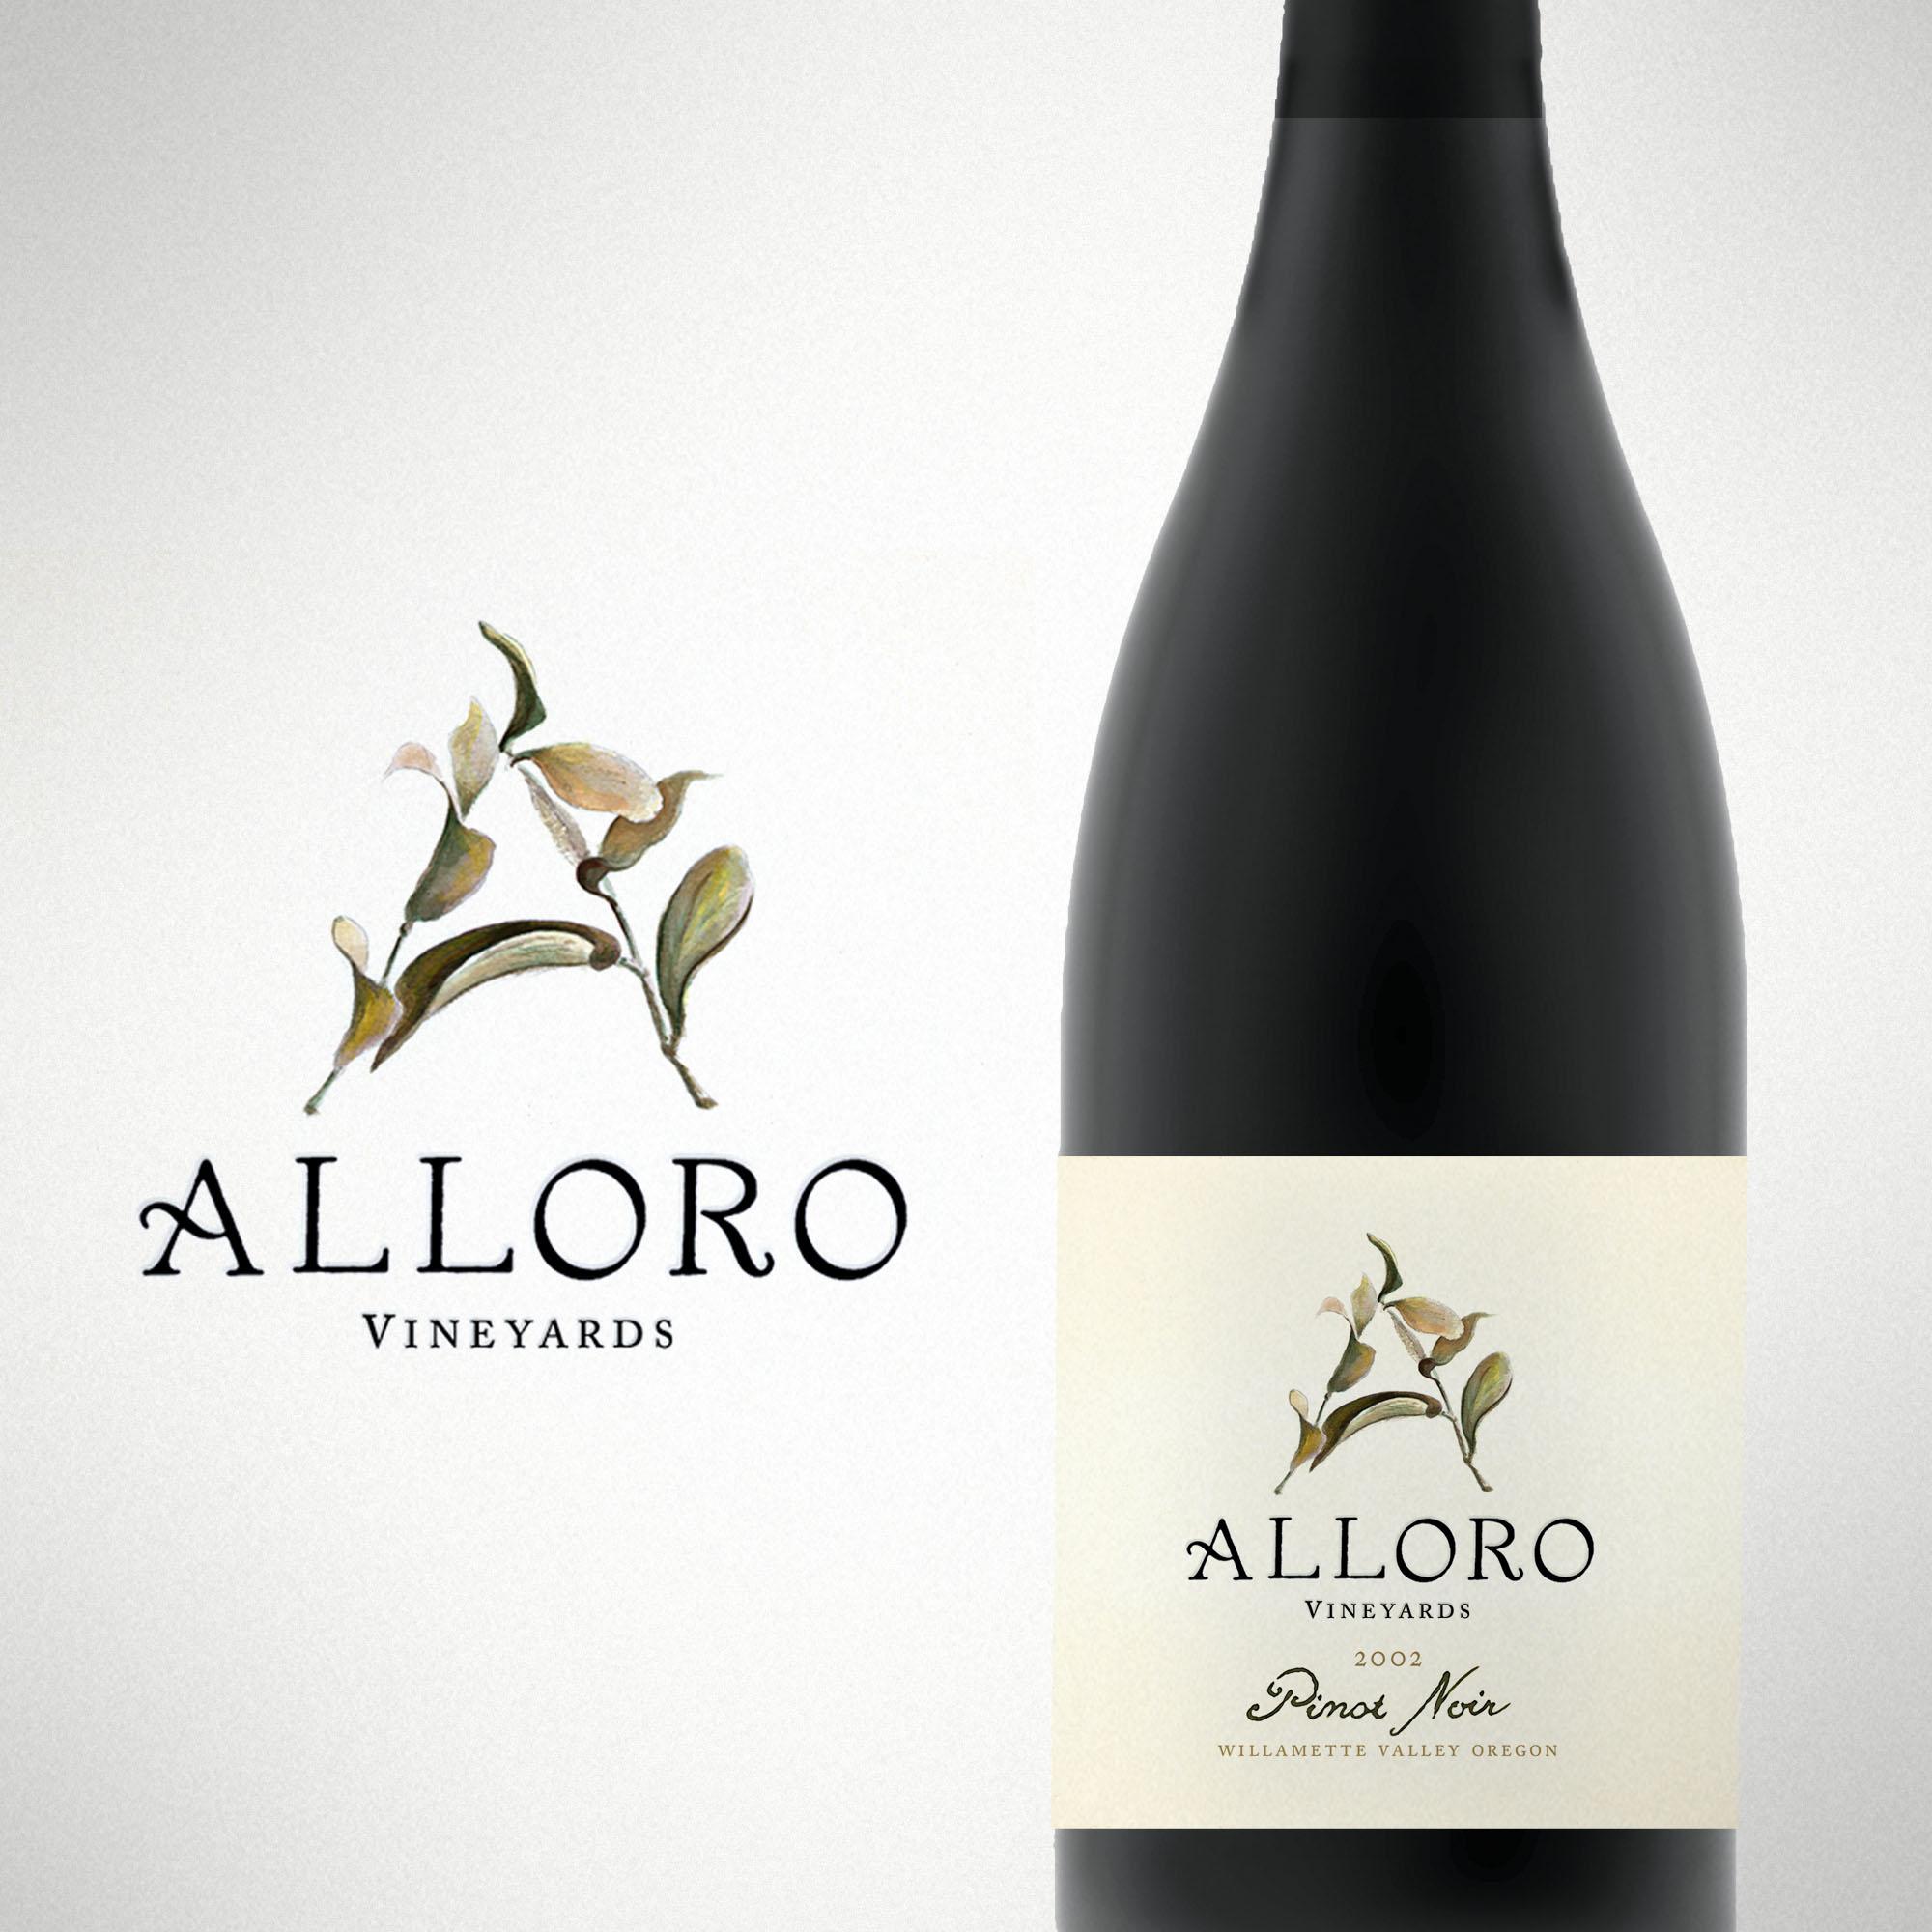 Alloro_bottle.jpg